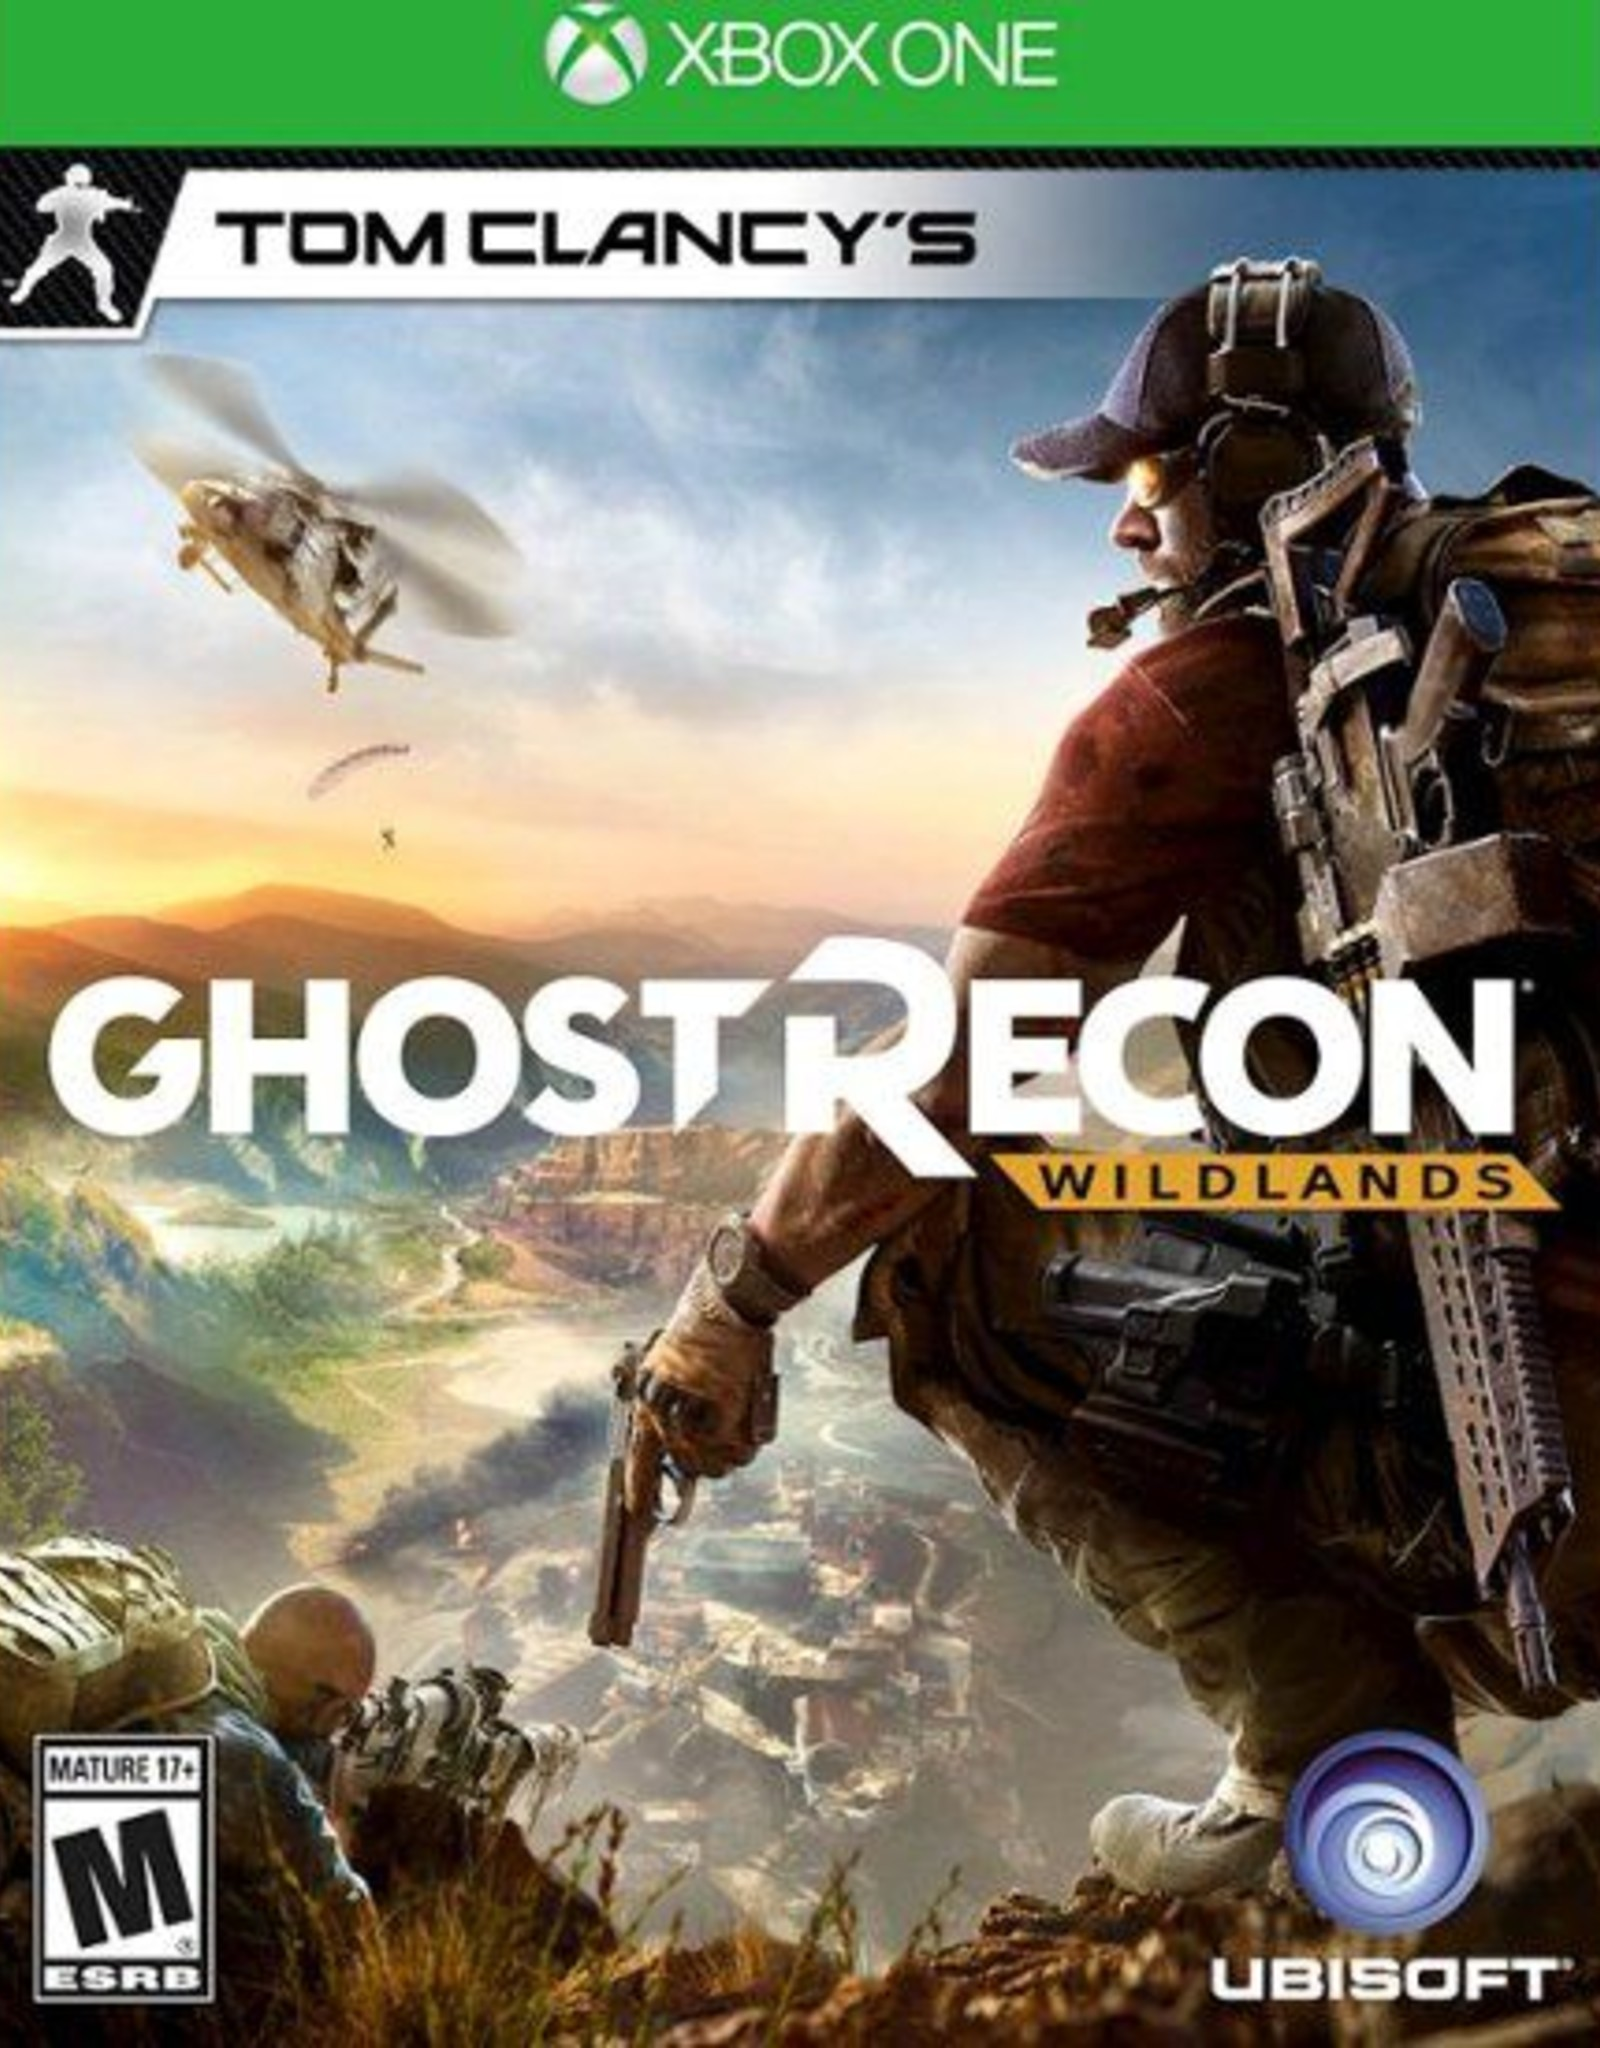 Tom Clancy's Ghost Recon Wildlands - XBOne DIGITAL